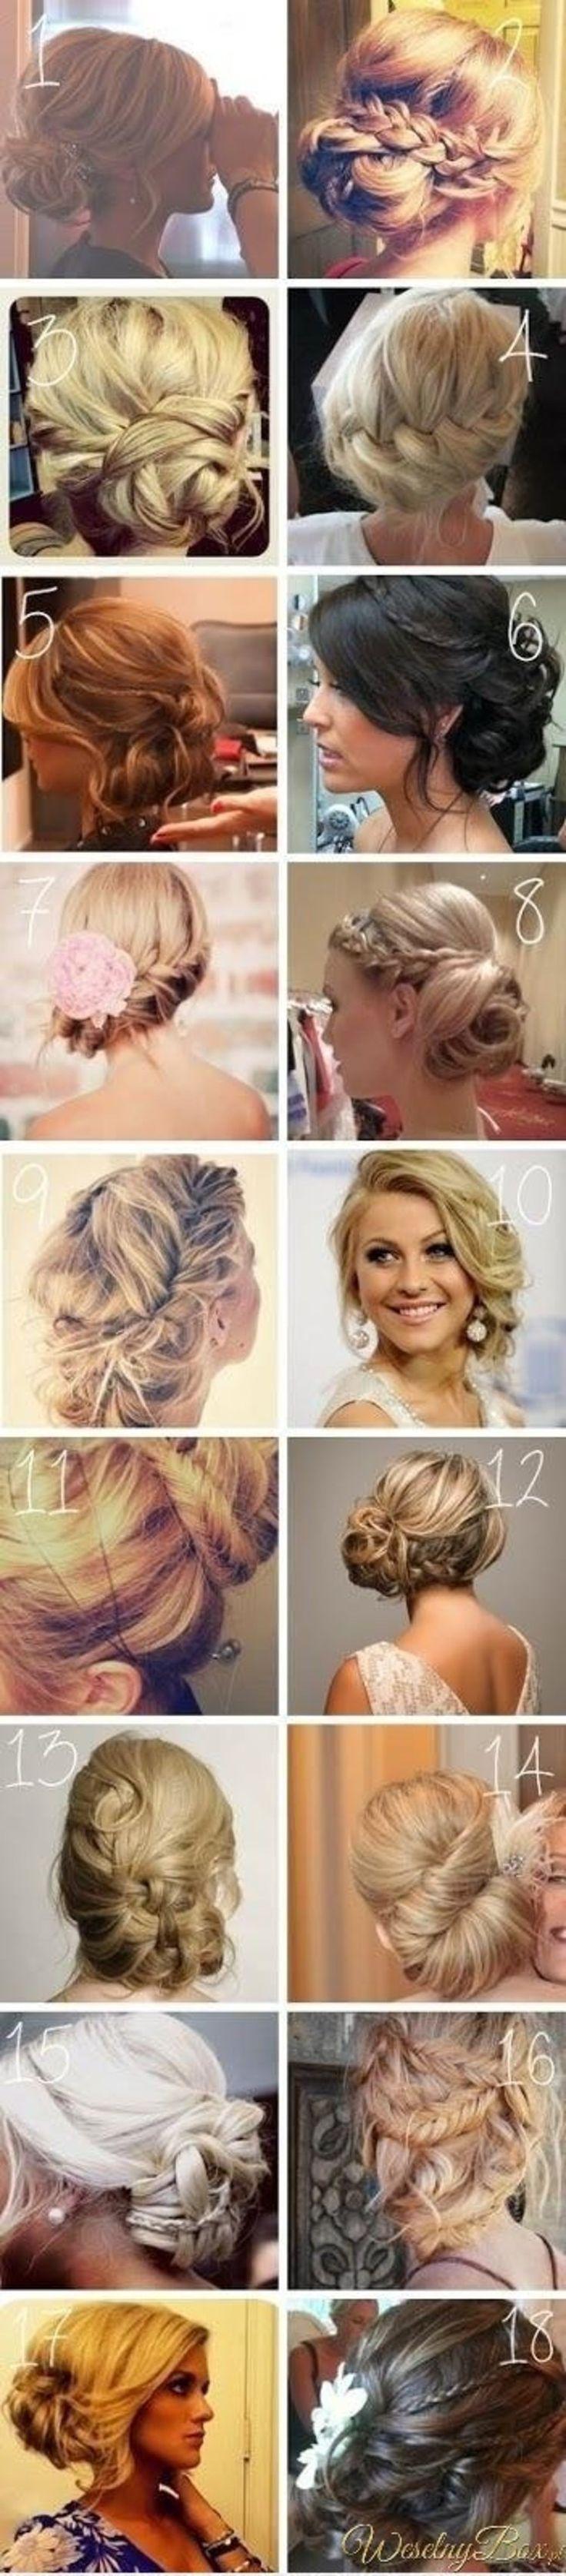 18 ślubnych fryzur